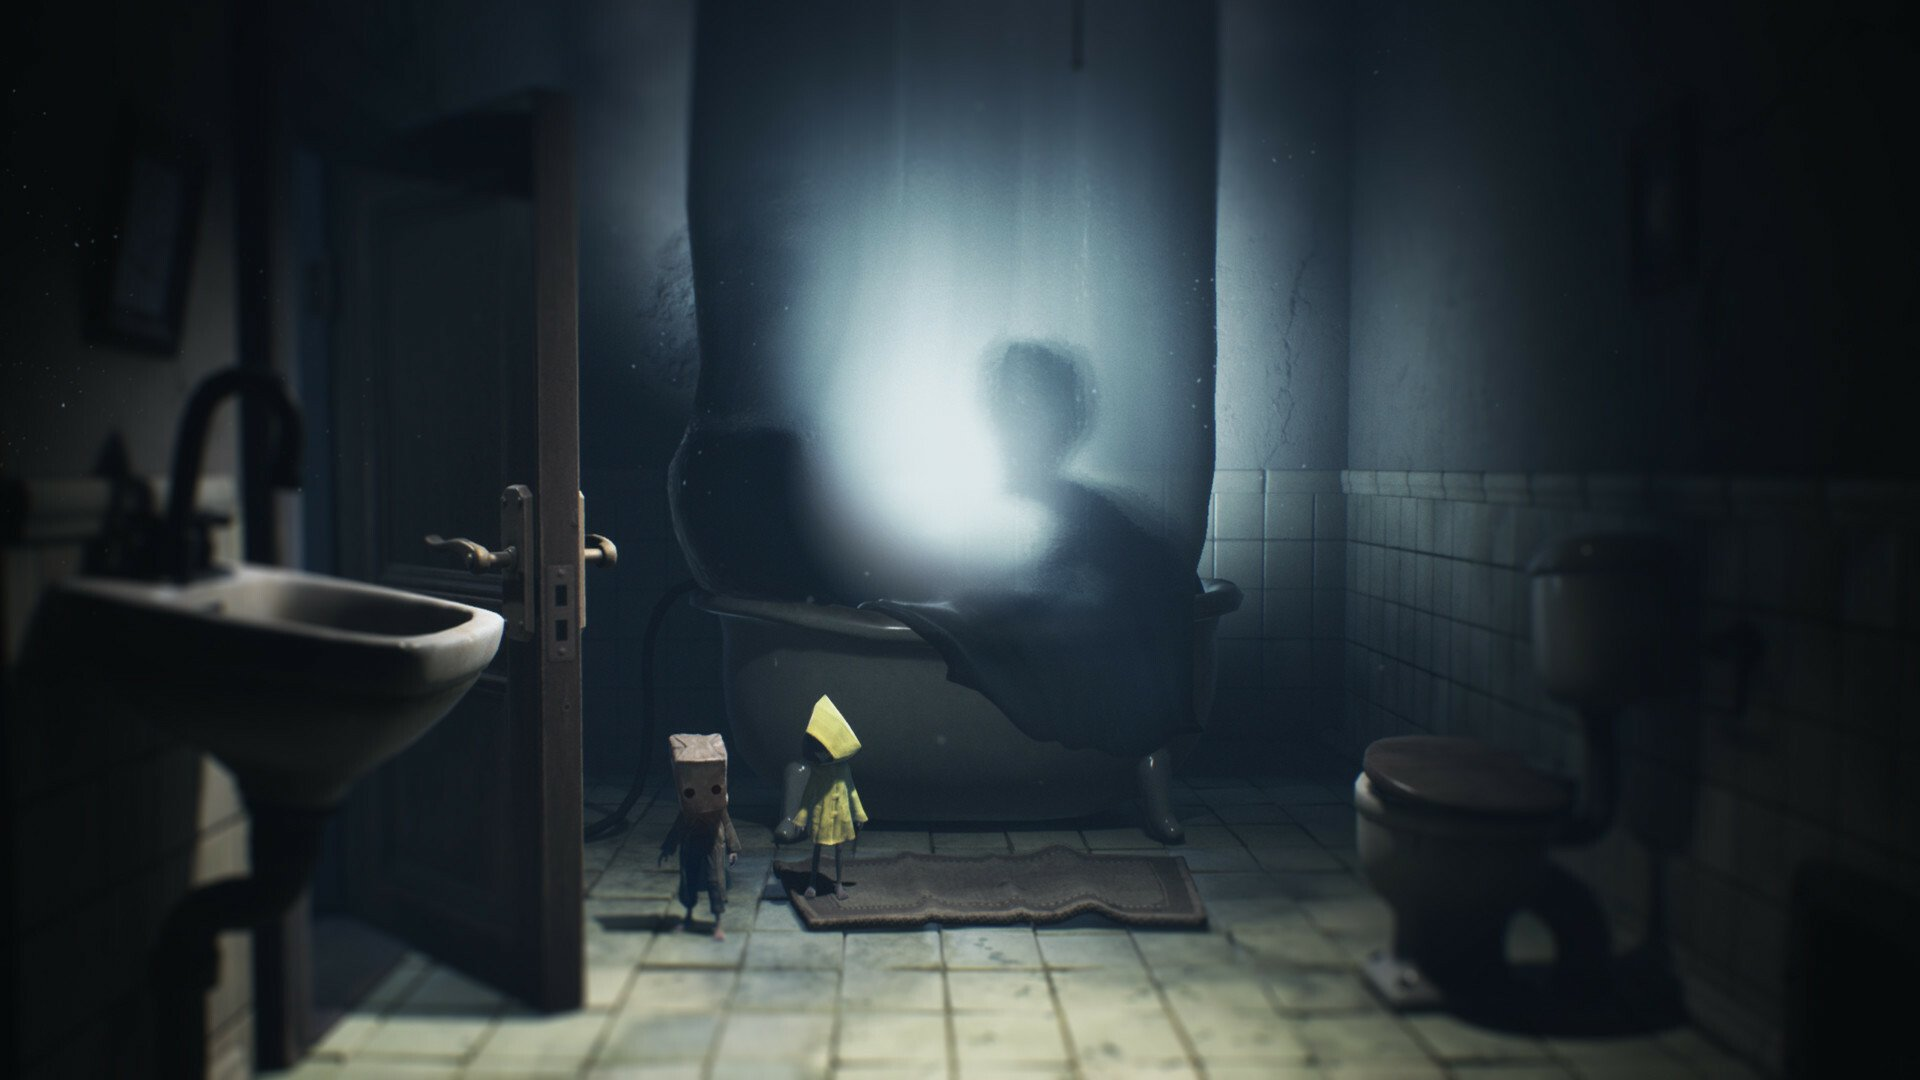 Screenshot for the game Little Nightmares II - Deluxe Edition v.5.7 [GOG] (2021) download torrent License